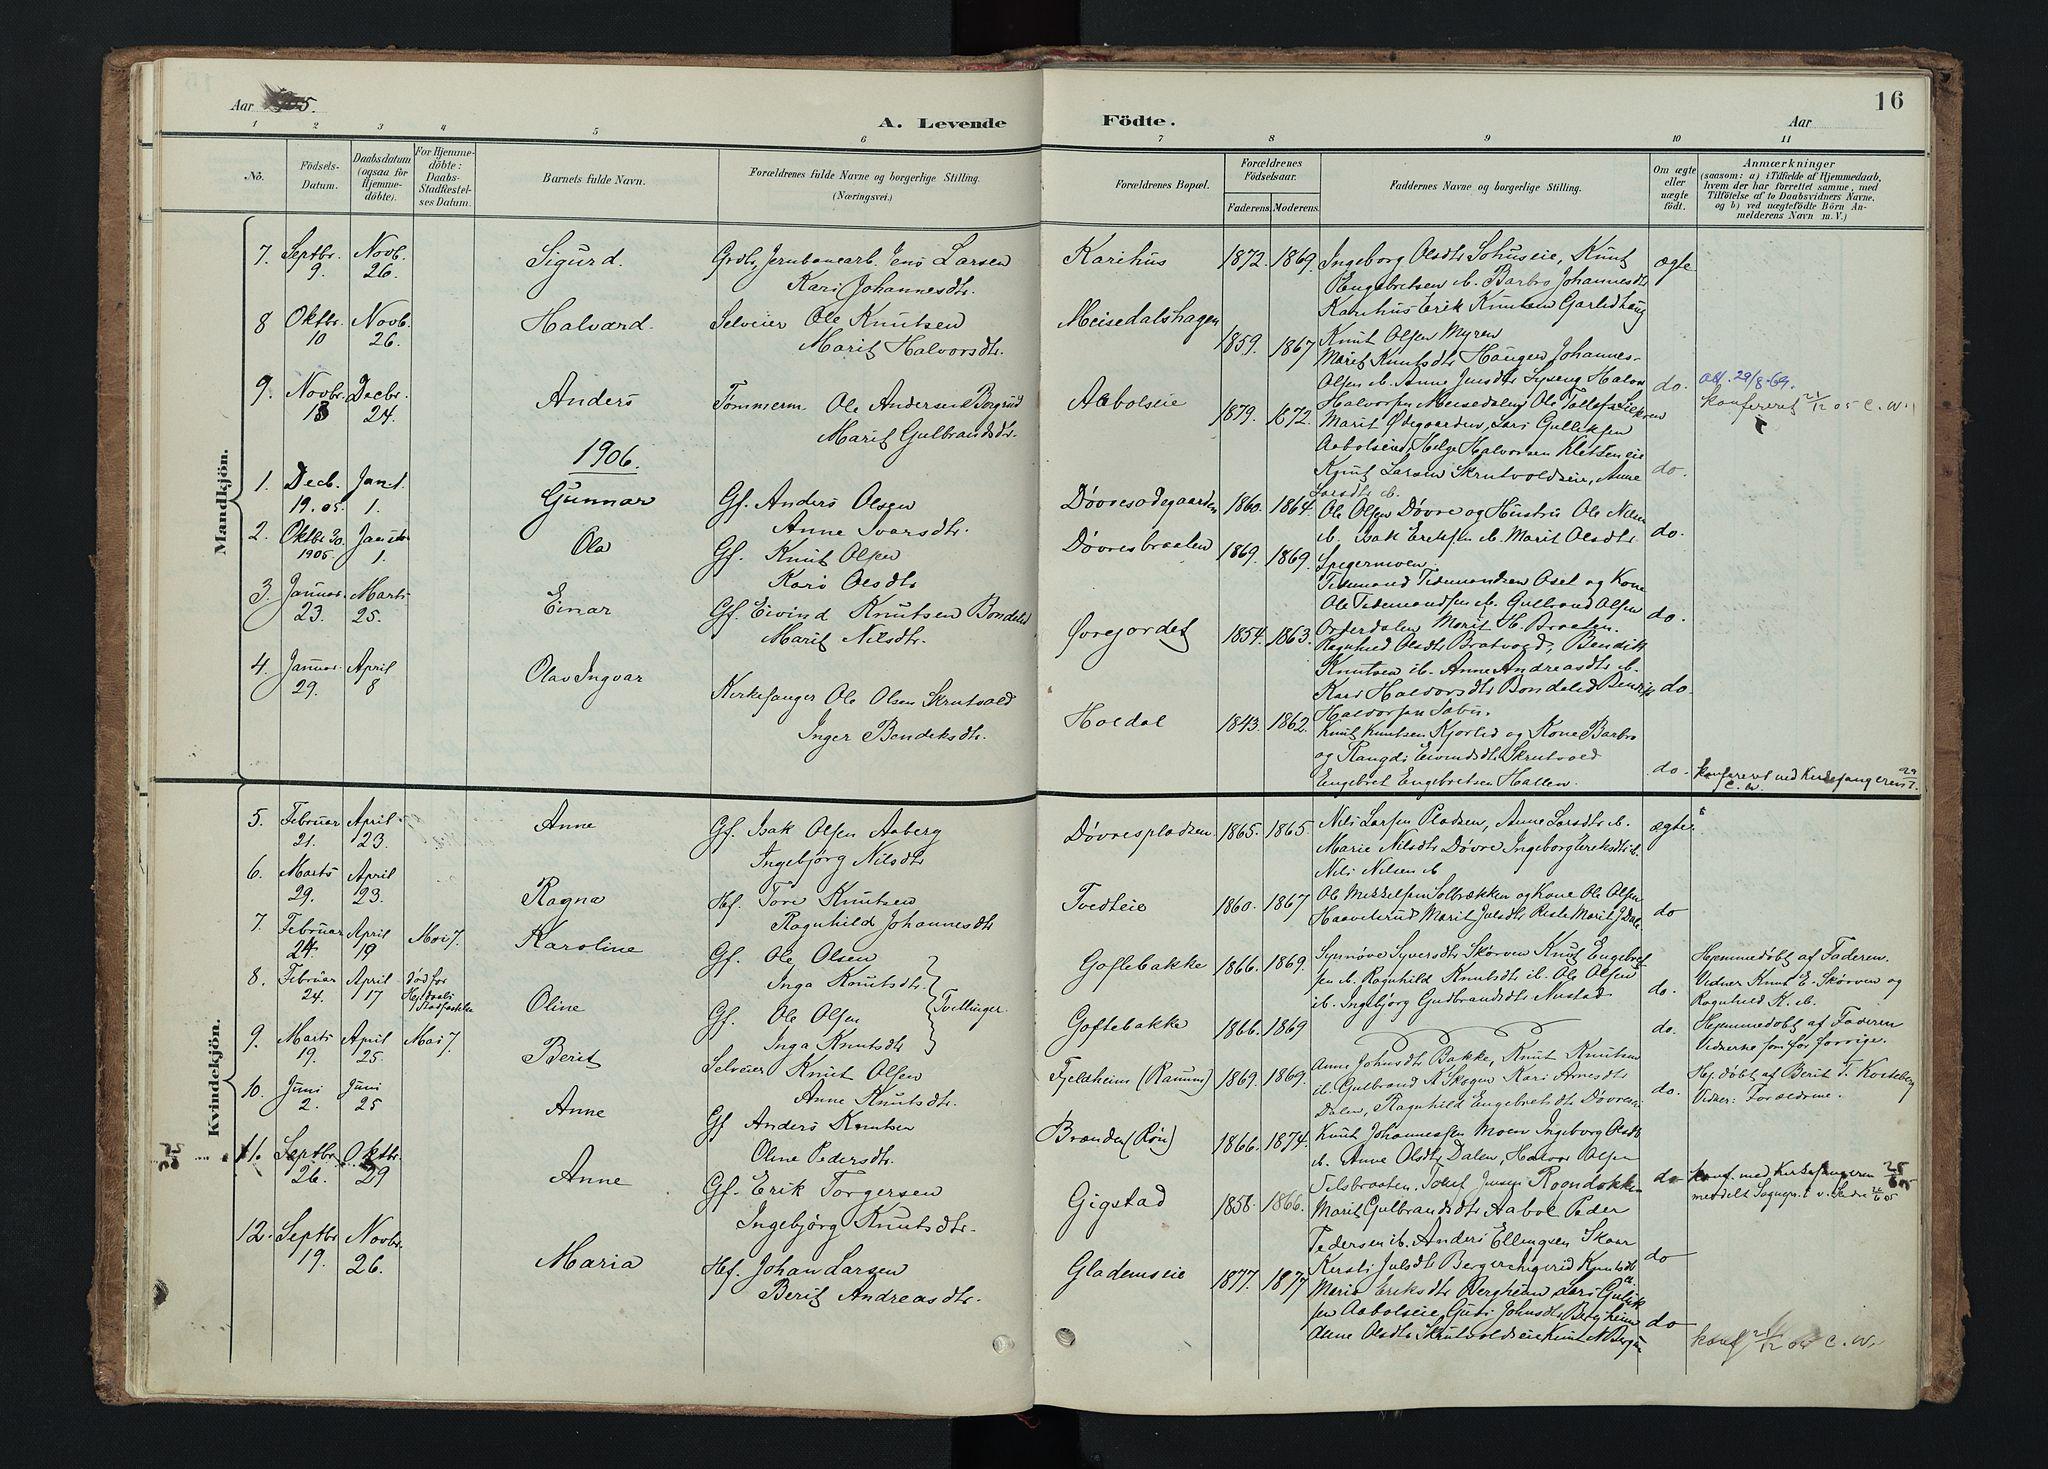 SAH, Nord-Aurdal prestekontor, Ministerialbok nr. 15, 1896-1914, s. 16